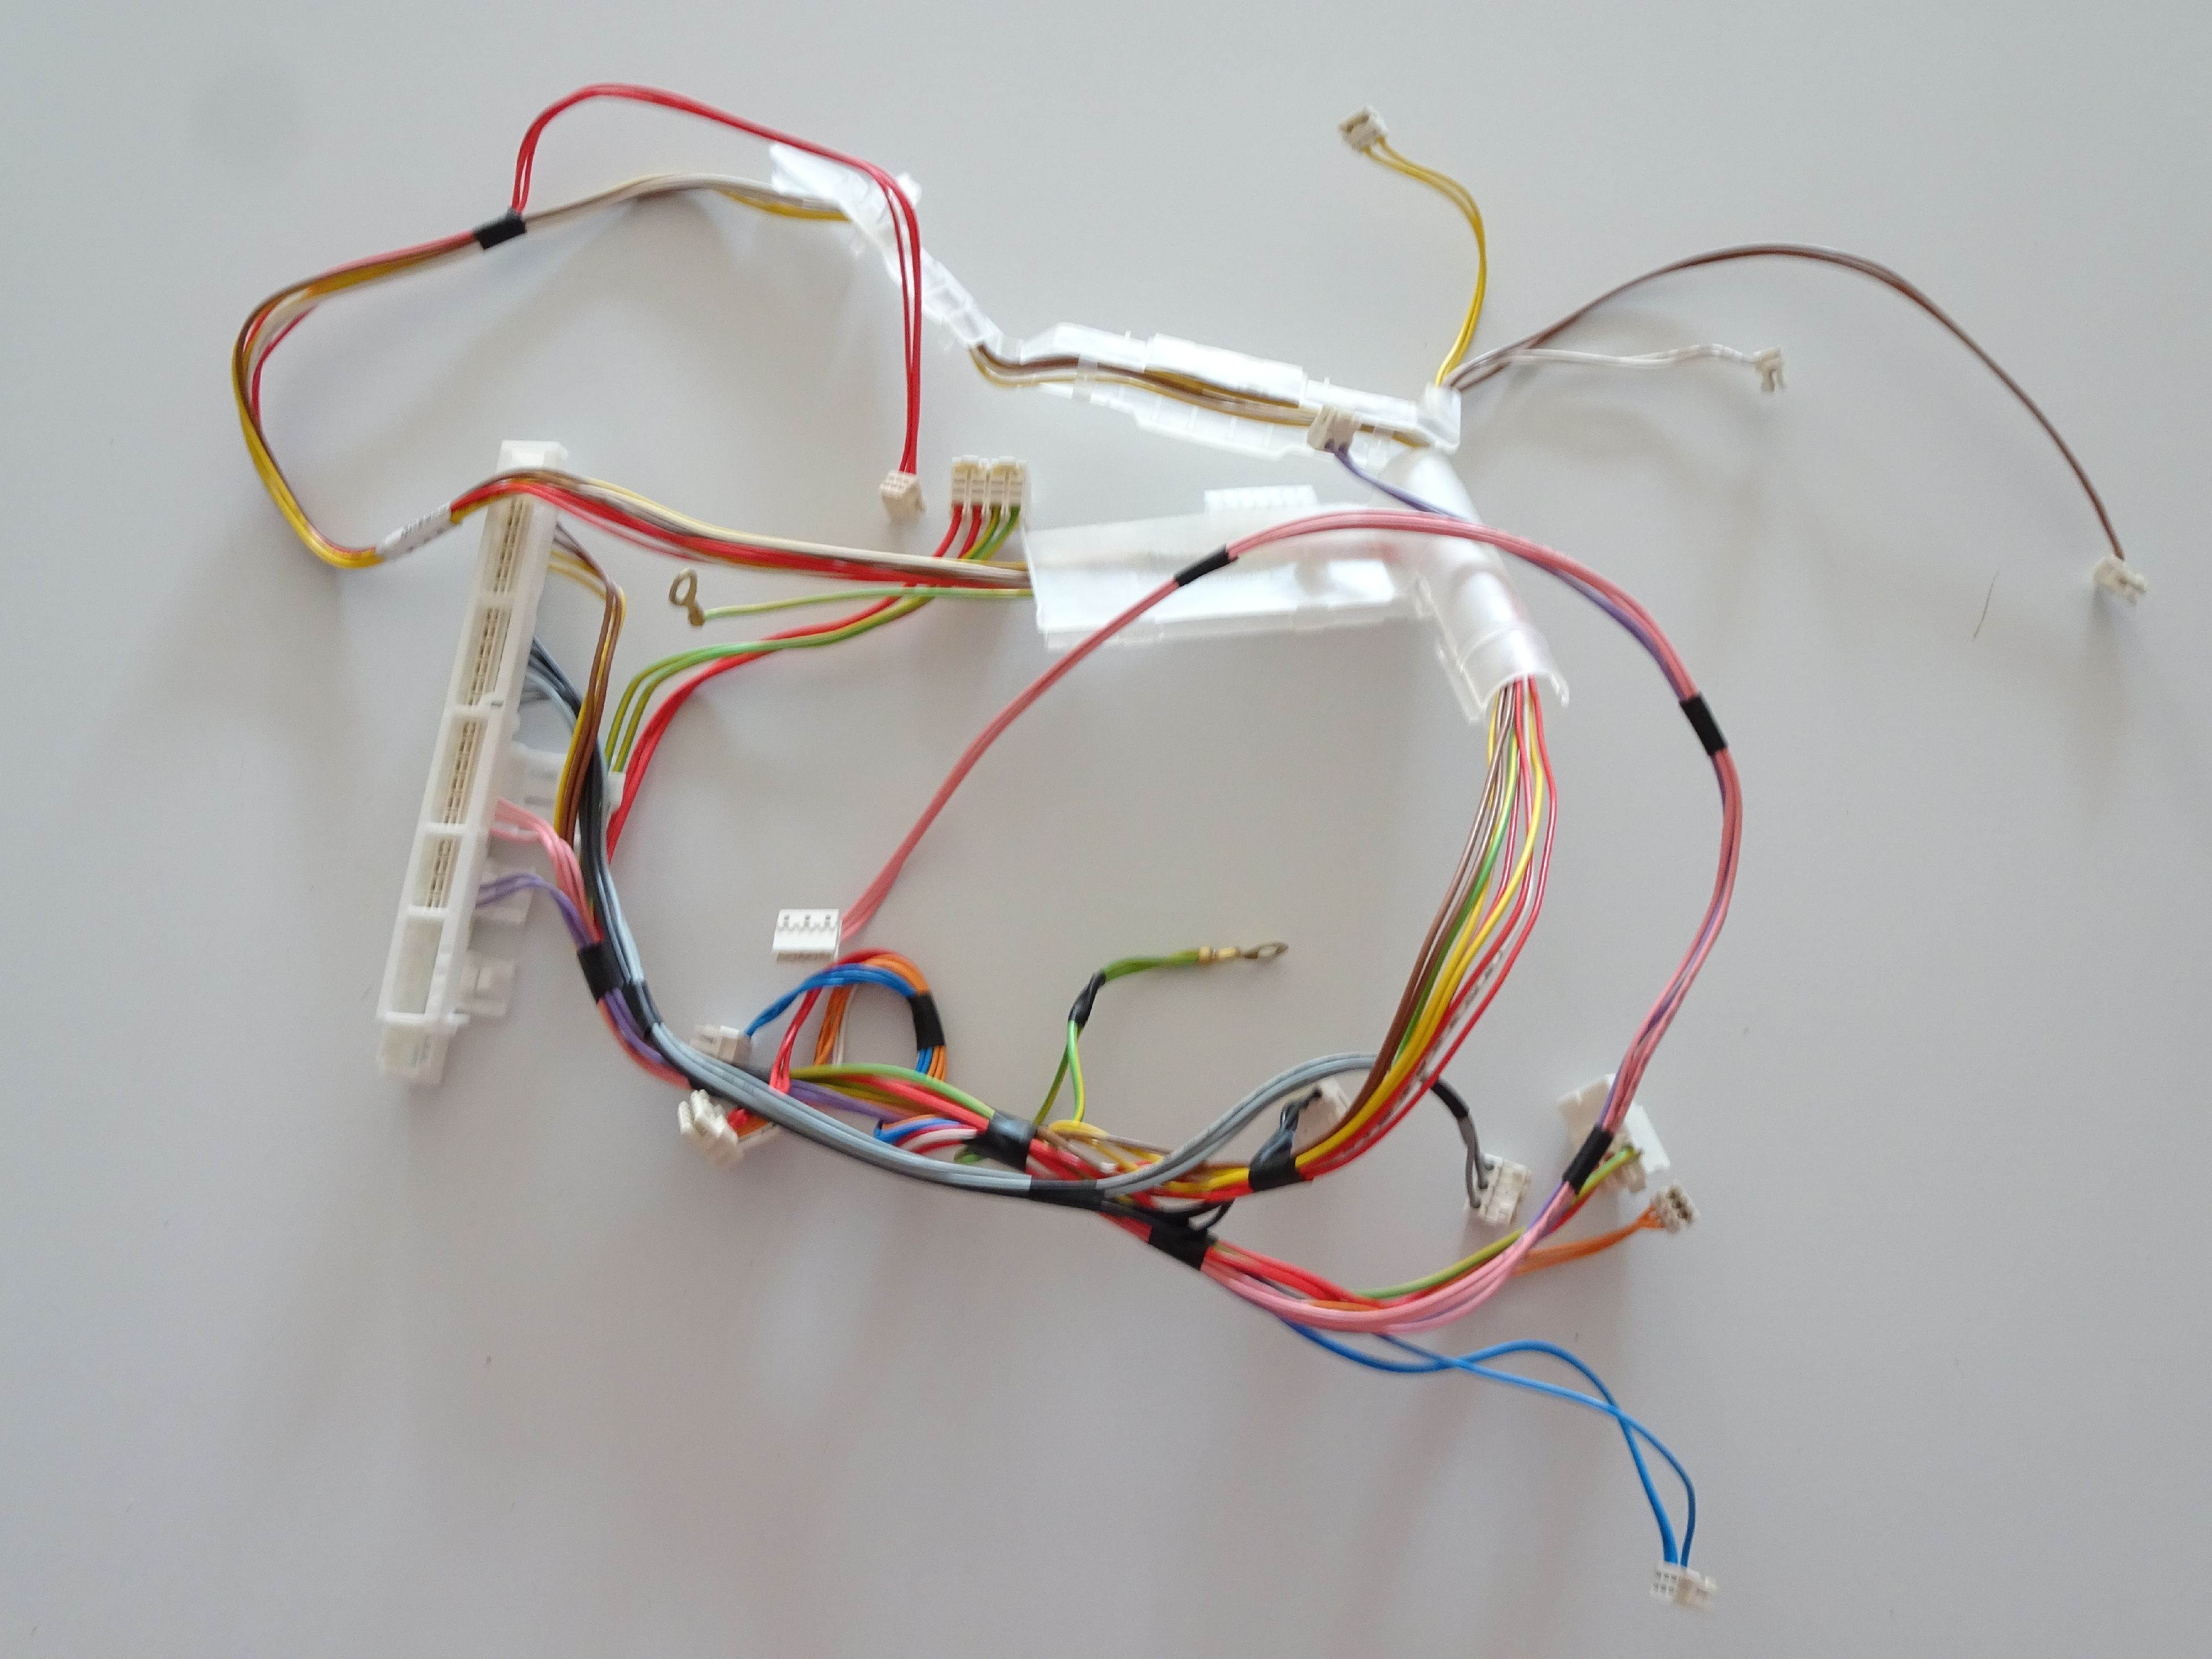 Bosch SHEM3AY55N Wire Harness AP6043475 12014146 - Walmart.com - Walmart.comWalmart.com